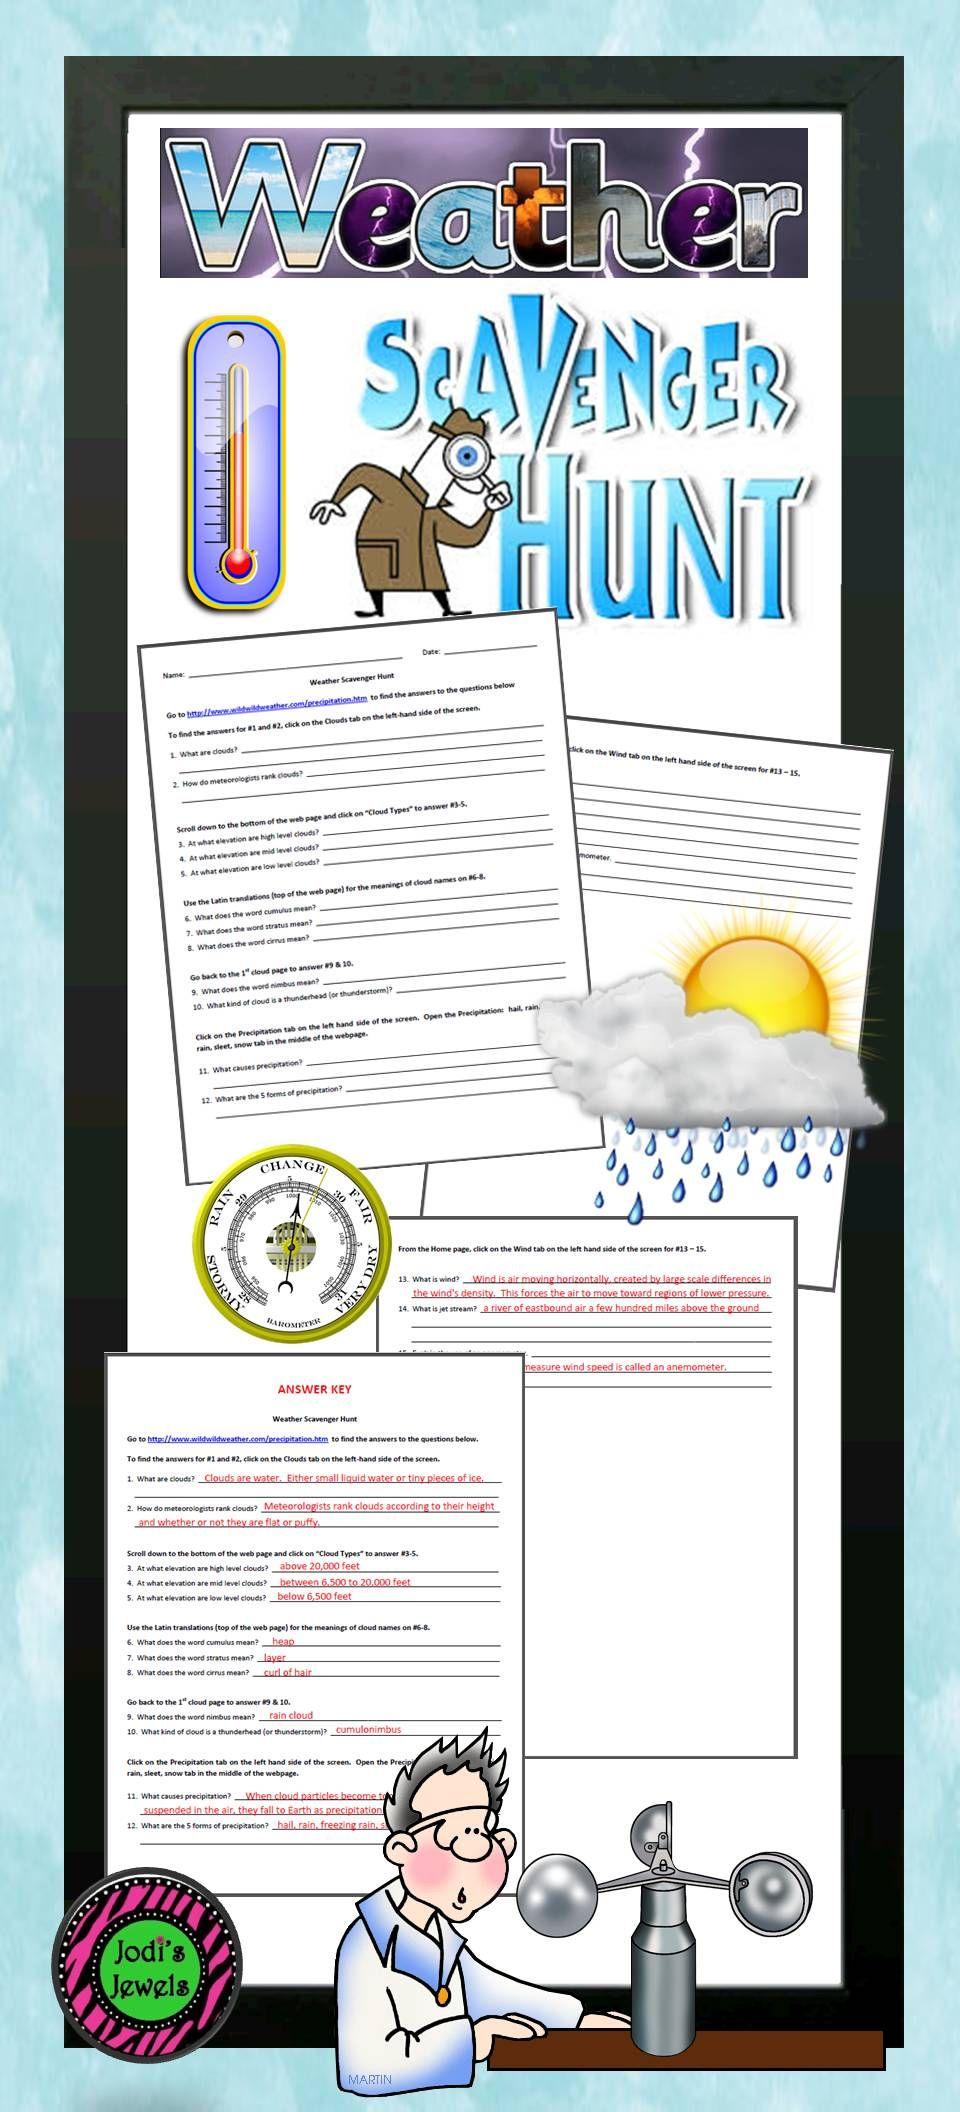 Internet Weather Scavenger Hunt Elementary School Science Elementary Science Activities Middle School Science